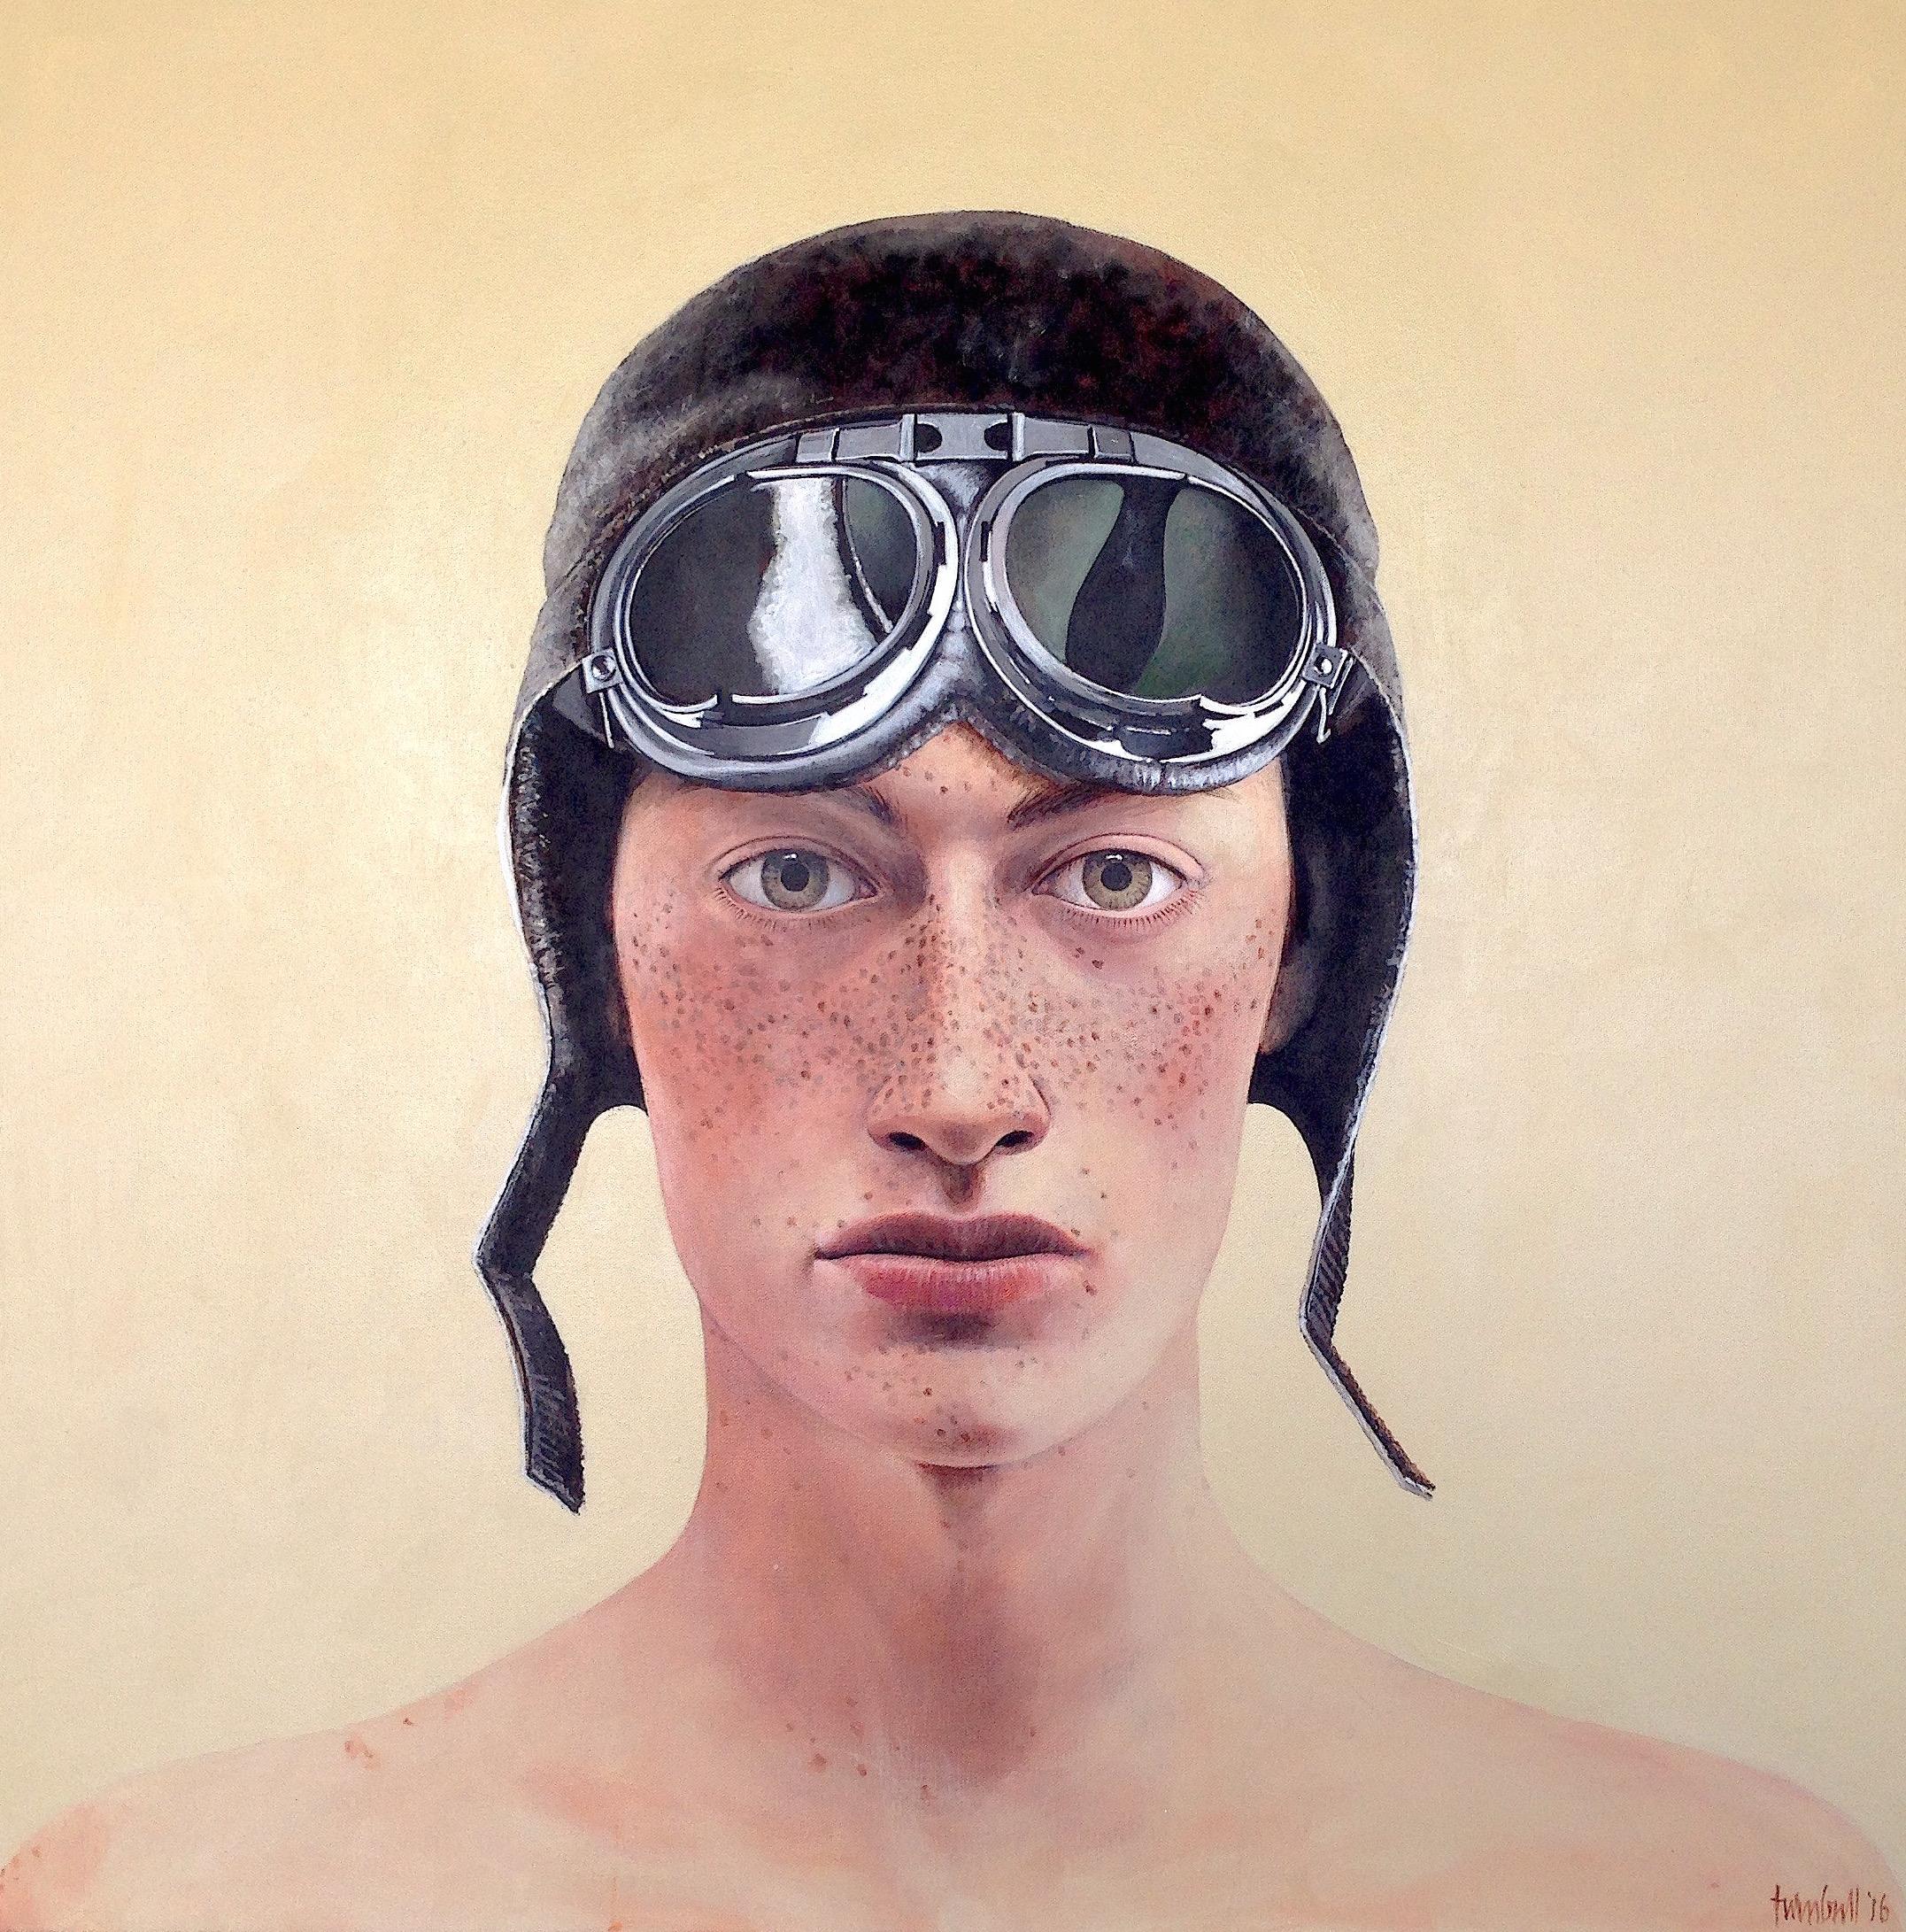 title-boy-aviator-date-2016-medium-acrylic-on-canvas-size-91-x91cm-price-3750